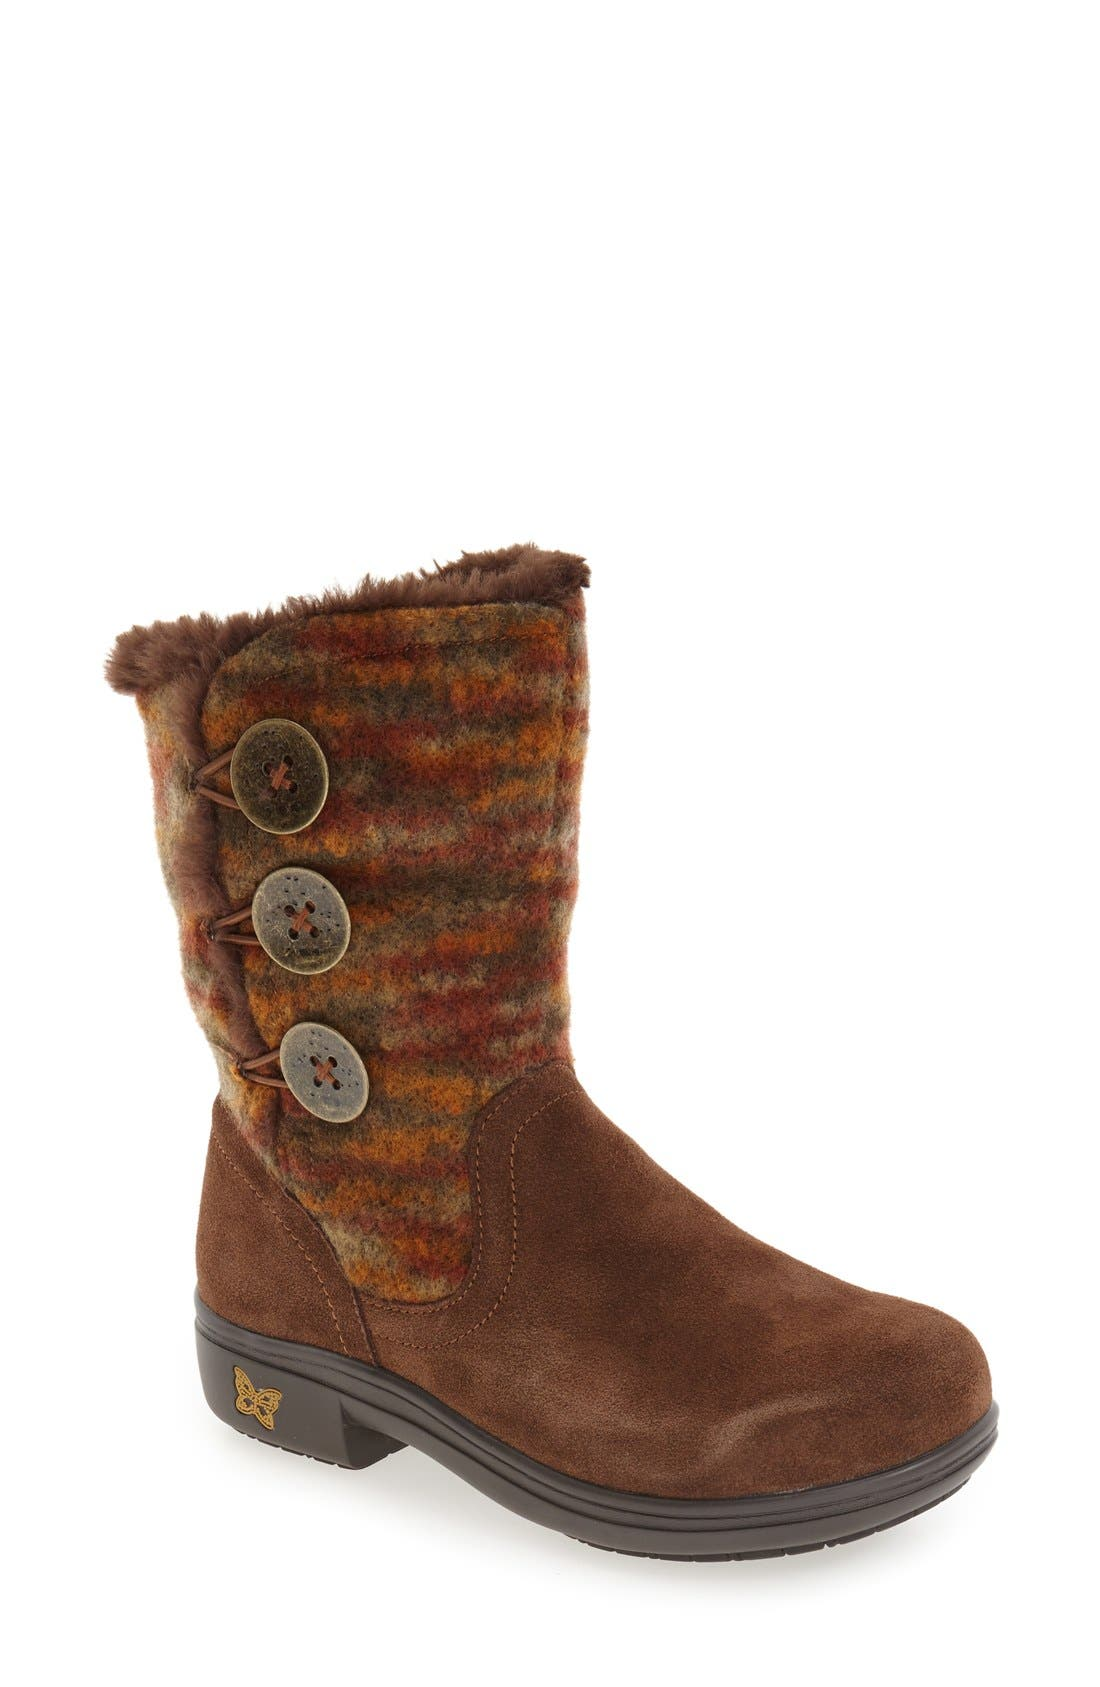 Alternate Image 1 Selected - Alegria 'Nanook' Suede Boot (Women)